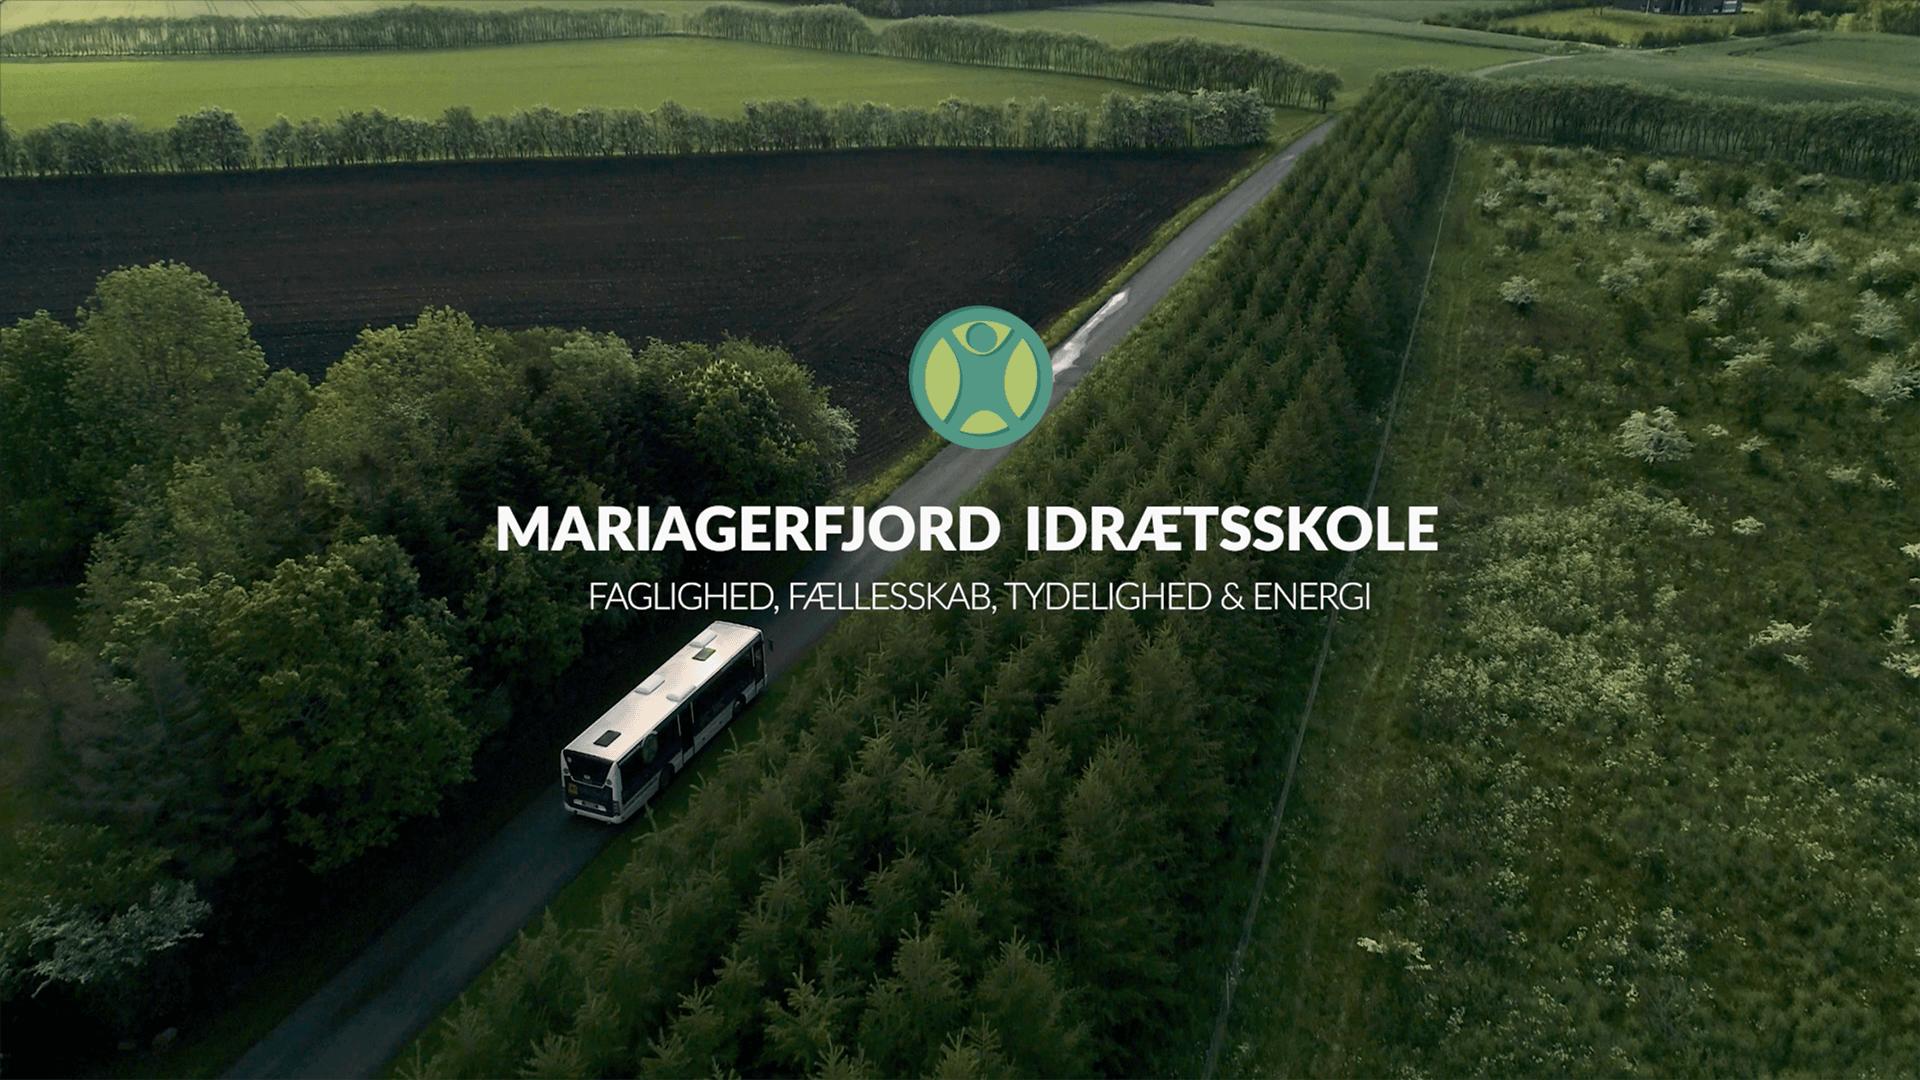 Mariagerfjord Idrætsskole Præsenteations video